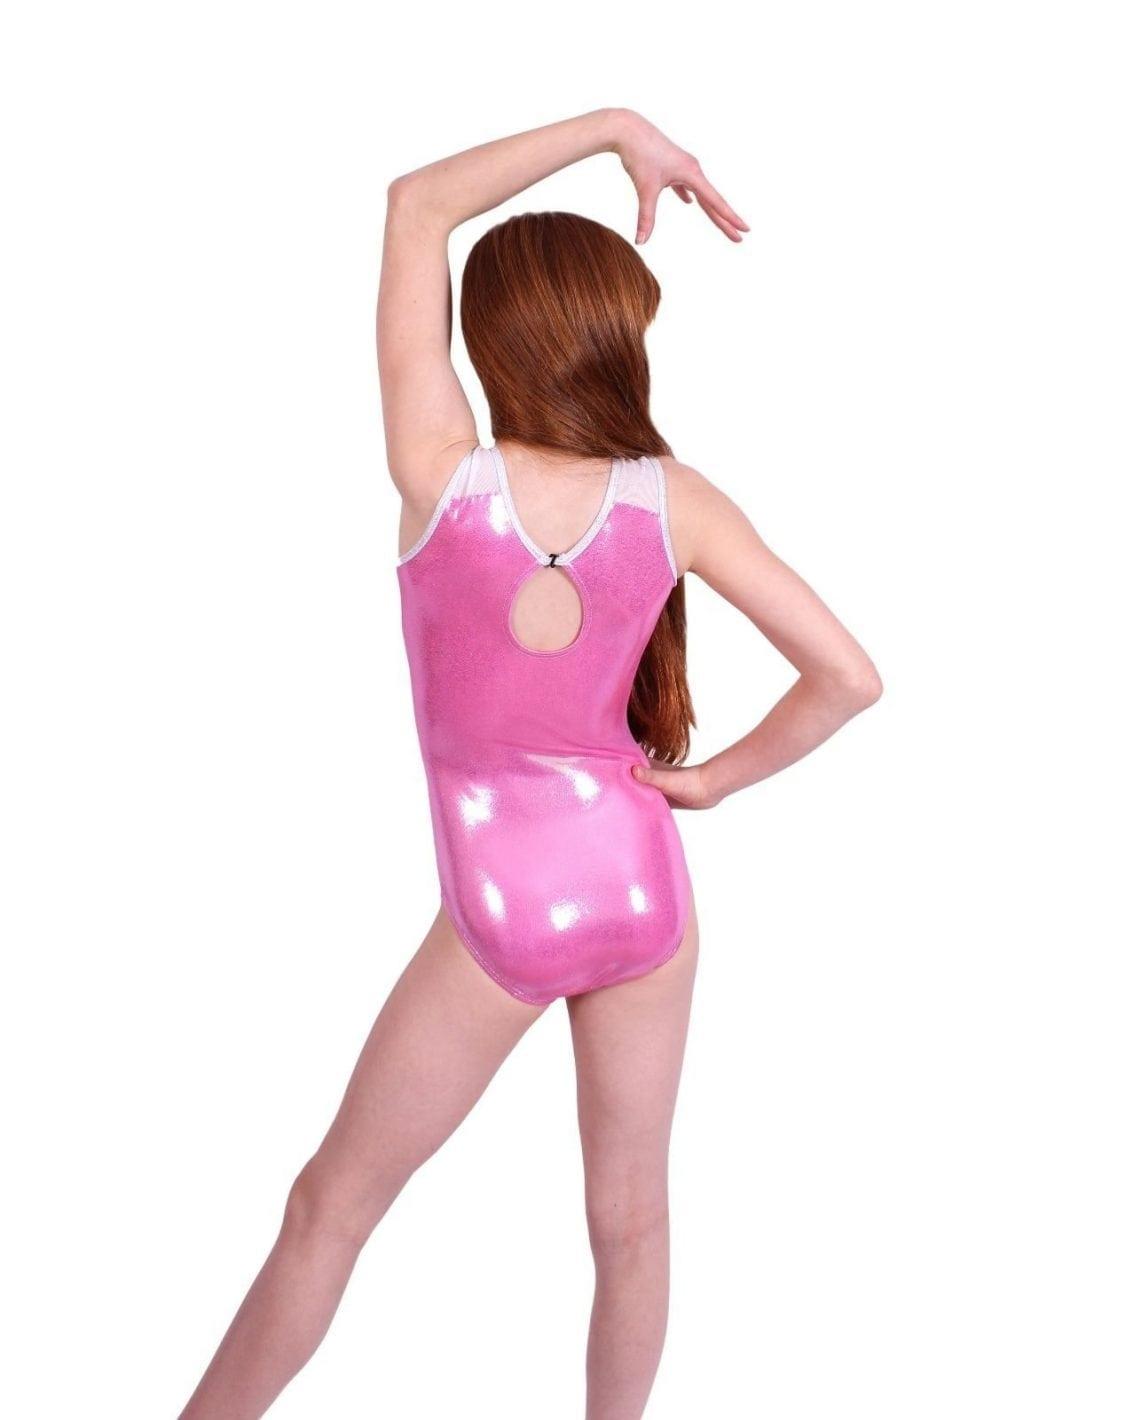 30b240361 Butterfly Hope Girls Gymnastics Leotard Pink or Purple - Lilachelene ...